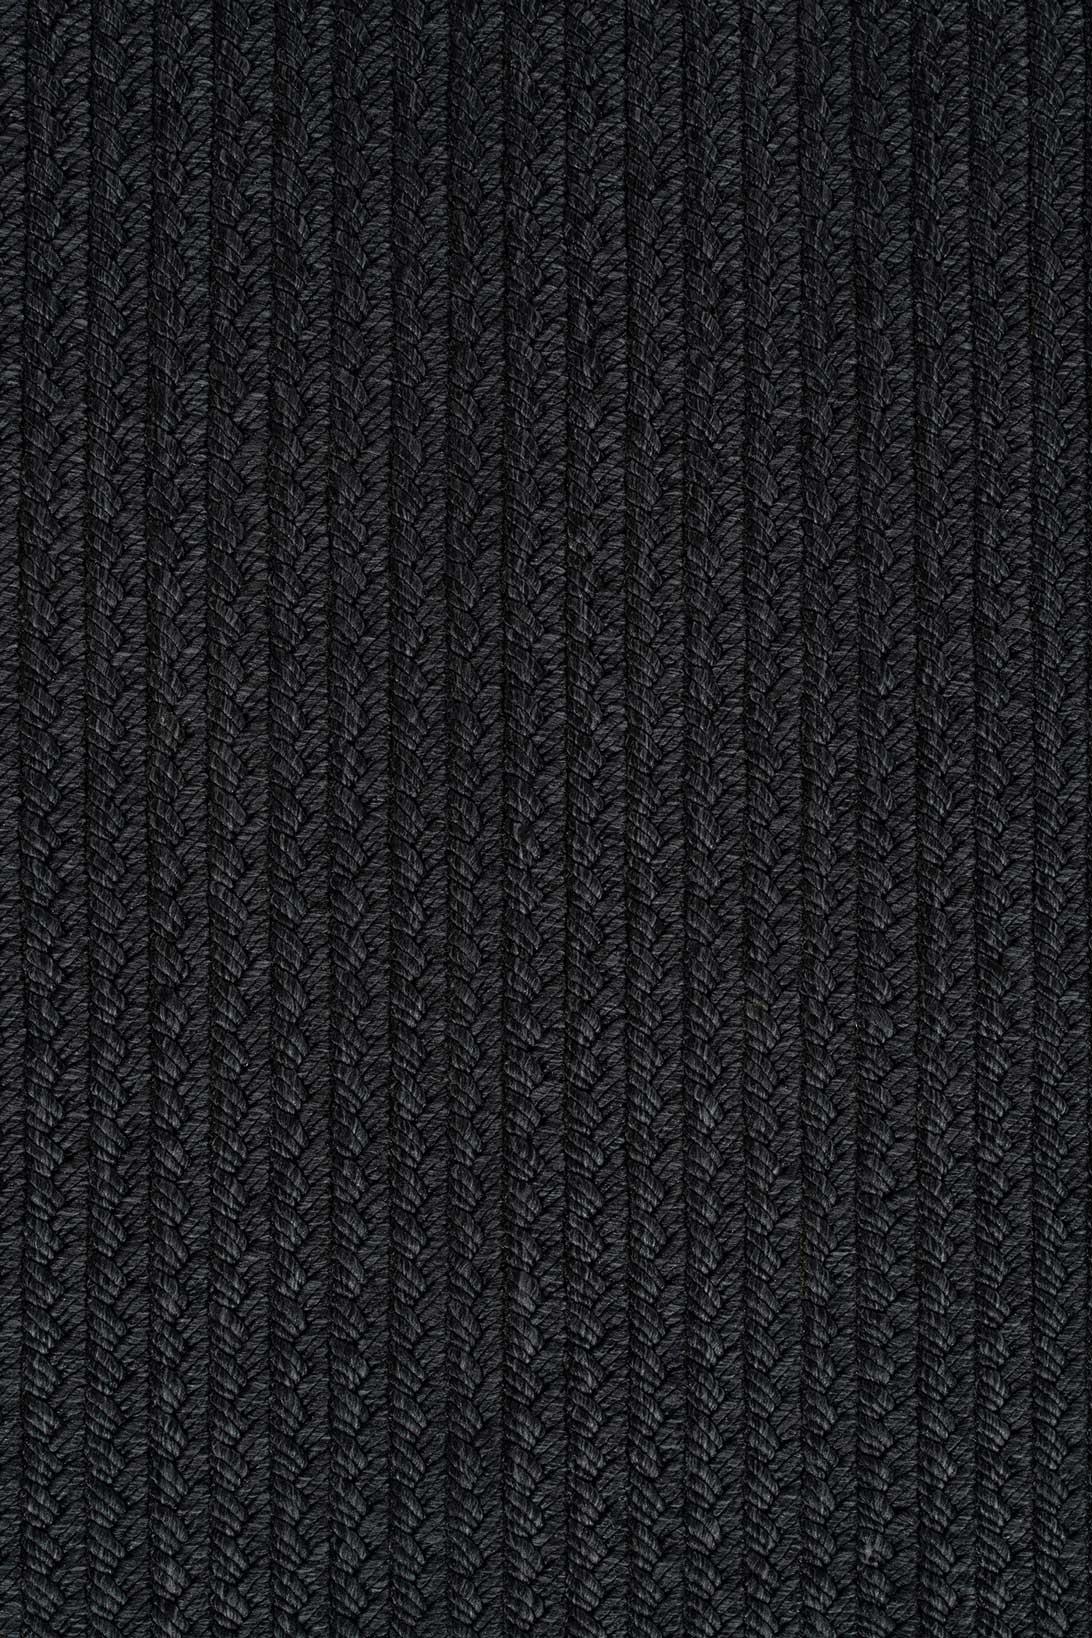 Bahch1_Bahamas-Charcoal_closeup